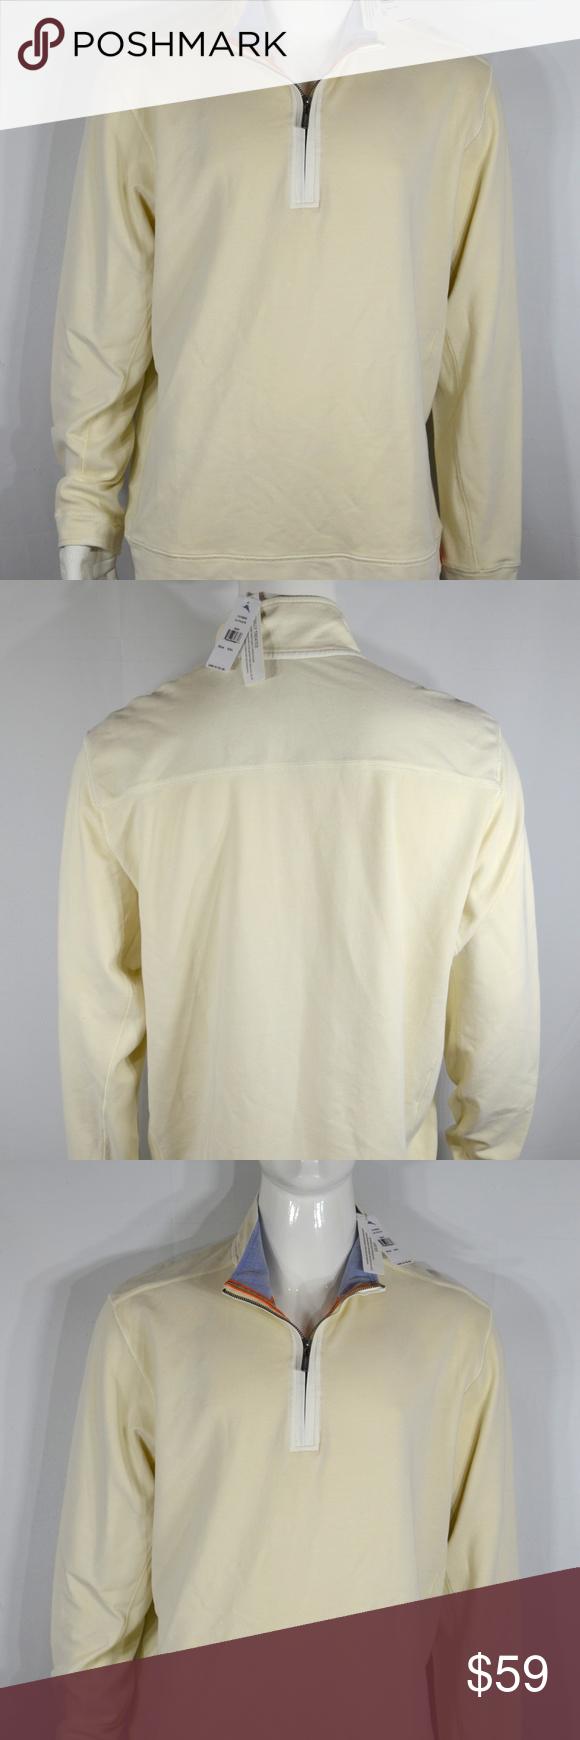 Tommy Bahama Men S Sweatshirt Xxl La Playa White Tommy Bahama Mens Mens Sweatshirts Tommy Bahama [ 1740 x 580 Pixel ]